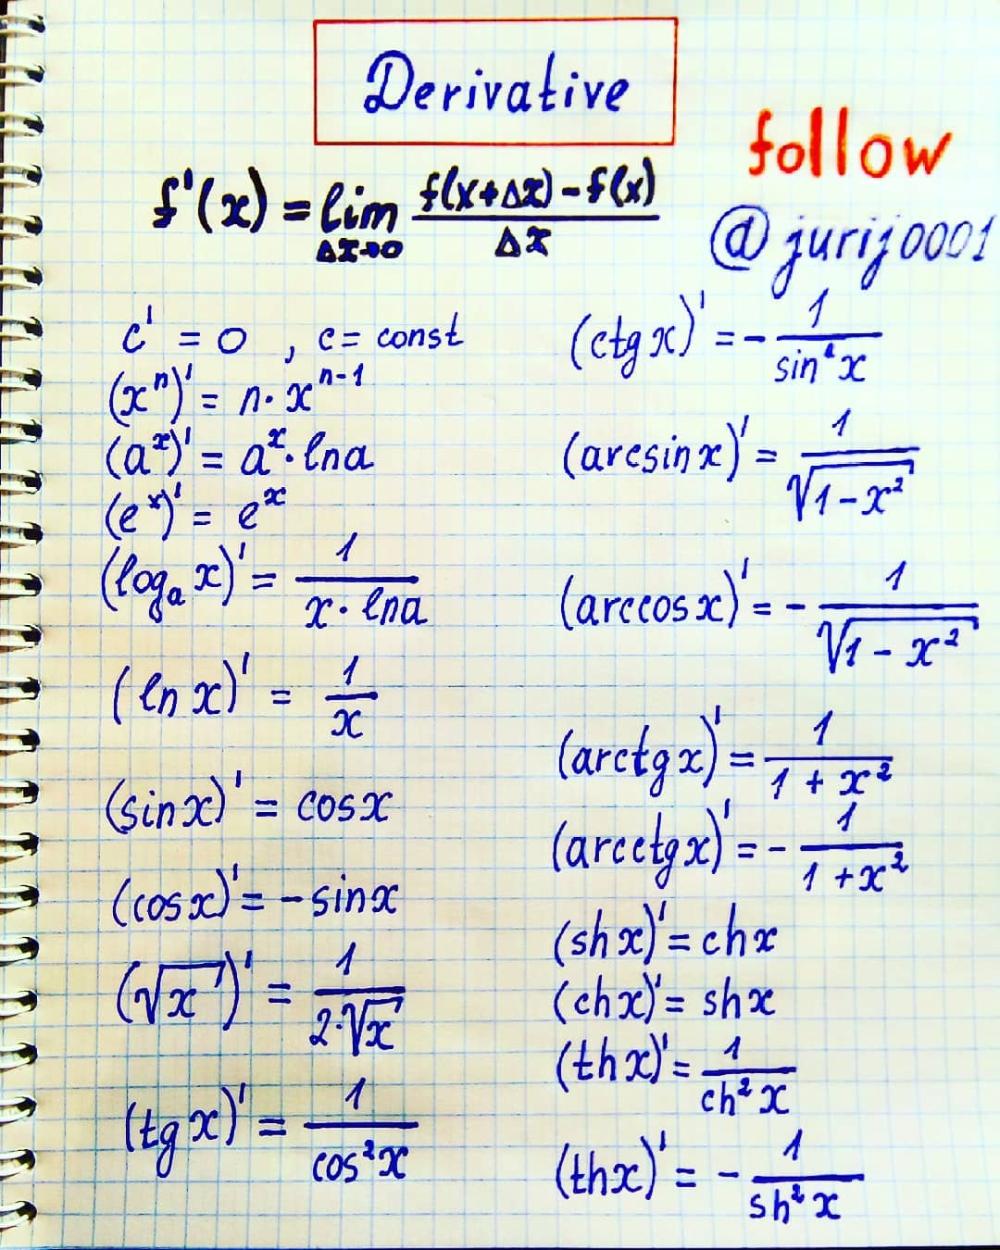 Derivative Physics Notes Follow Jurij0001 Friends In The Last Formula Cthx Physicis Physics Physicsnotes Calculus Notes Physics Notes Math Notes [ 1250 x 1000 Pixel ]